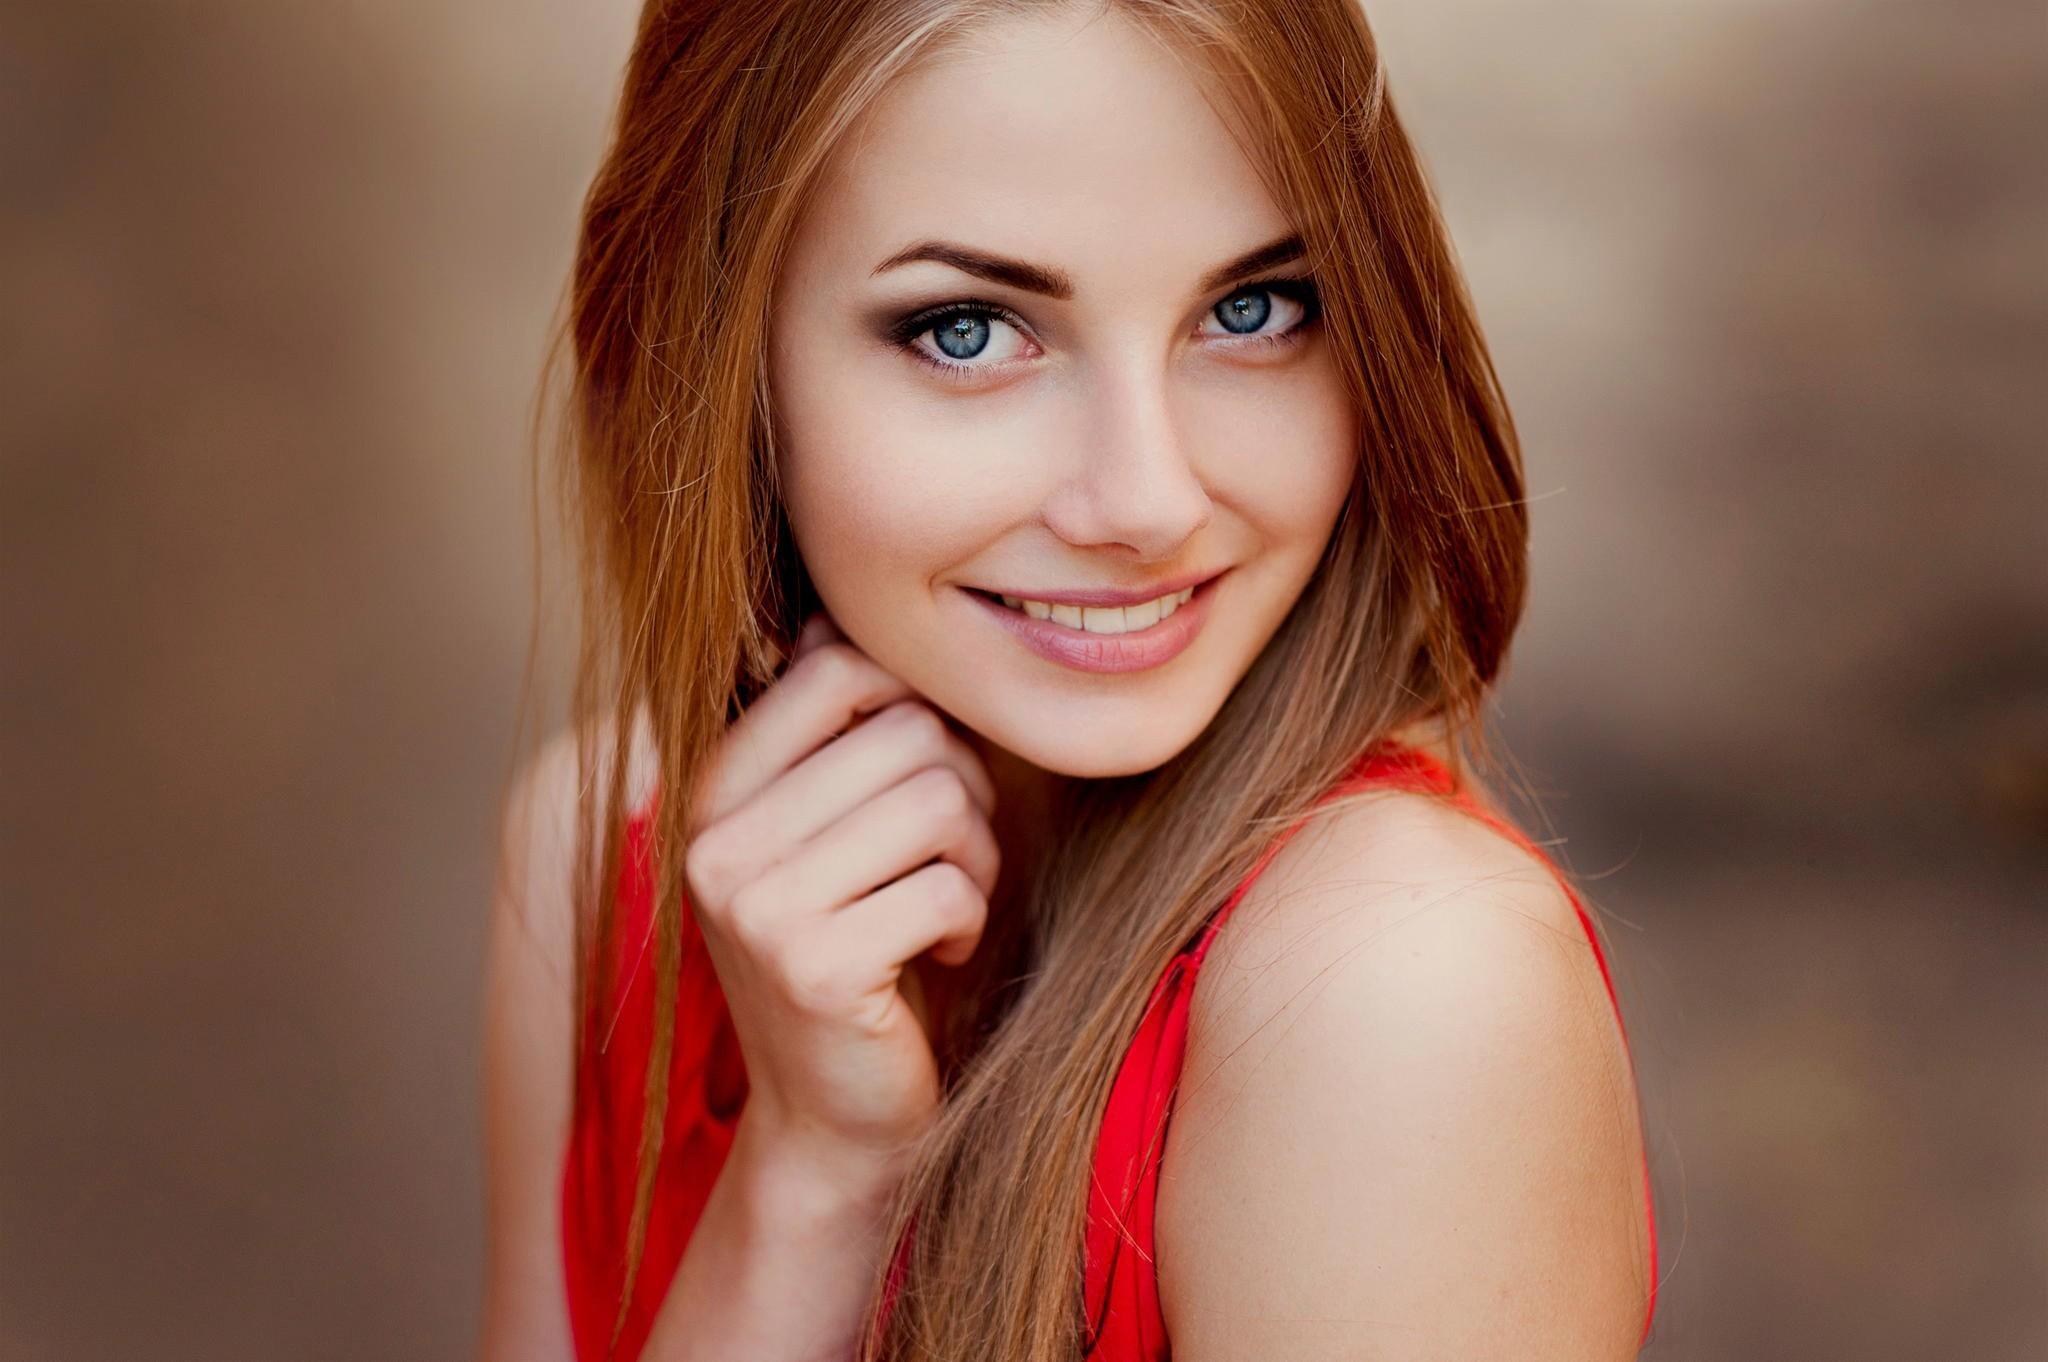 Blonde girl blue eyes, hair naked red teen